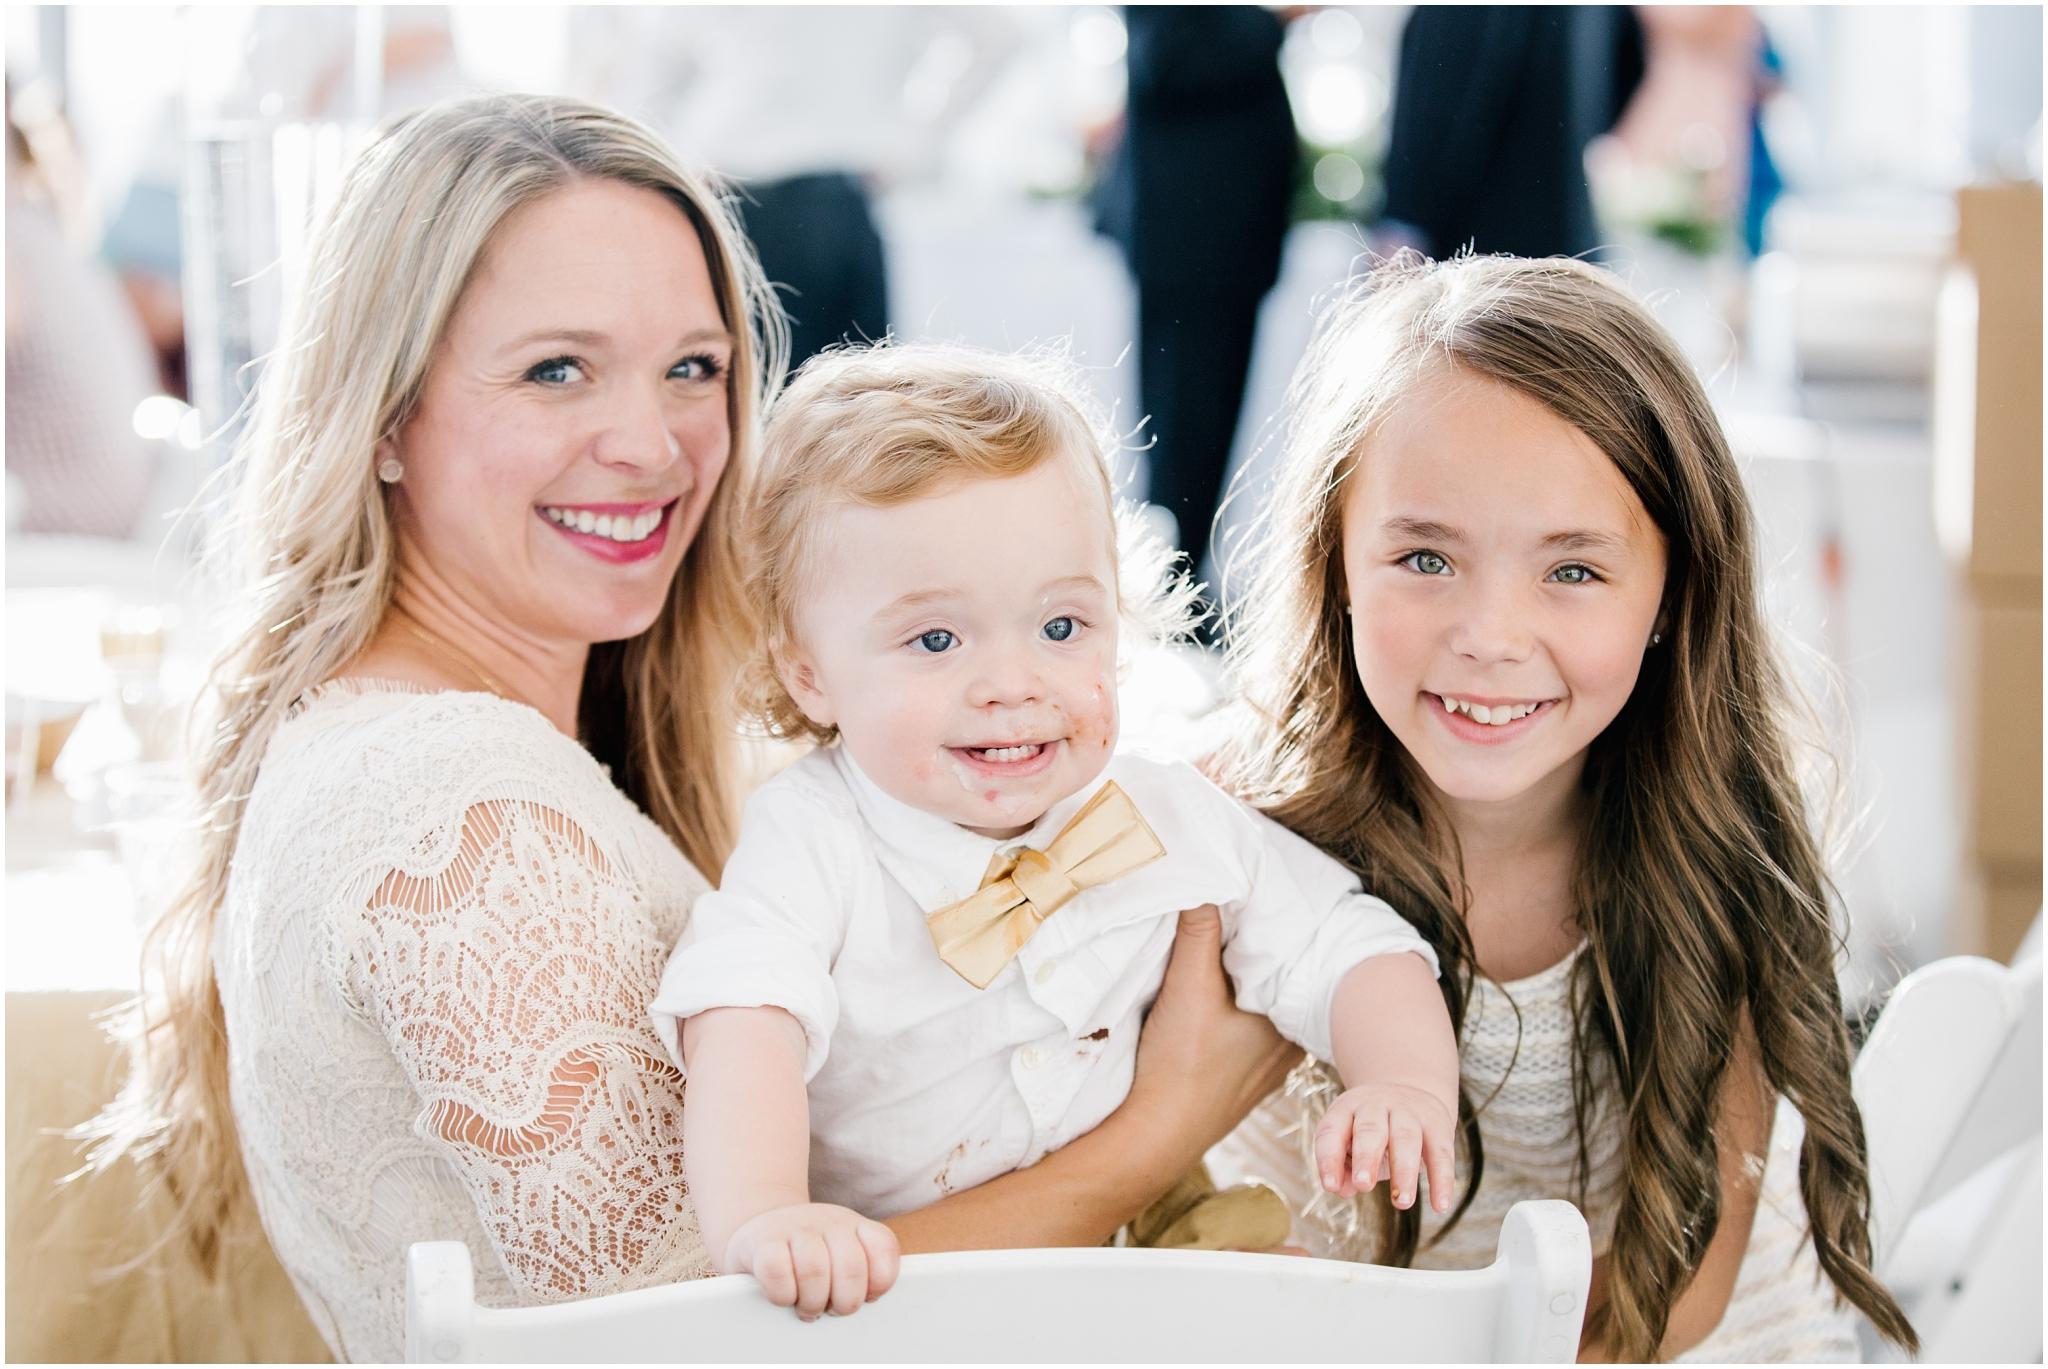 CherylandTyler-494_Lizzie-B-Imagery-Utah-Wedding-Photographer-Salt-Lake-City-Temple-Wells-Fargo-Building-Reception.jpg